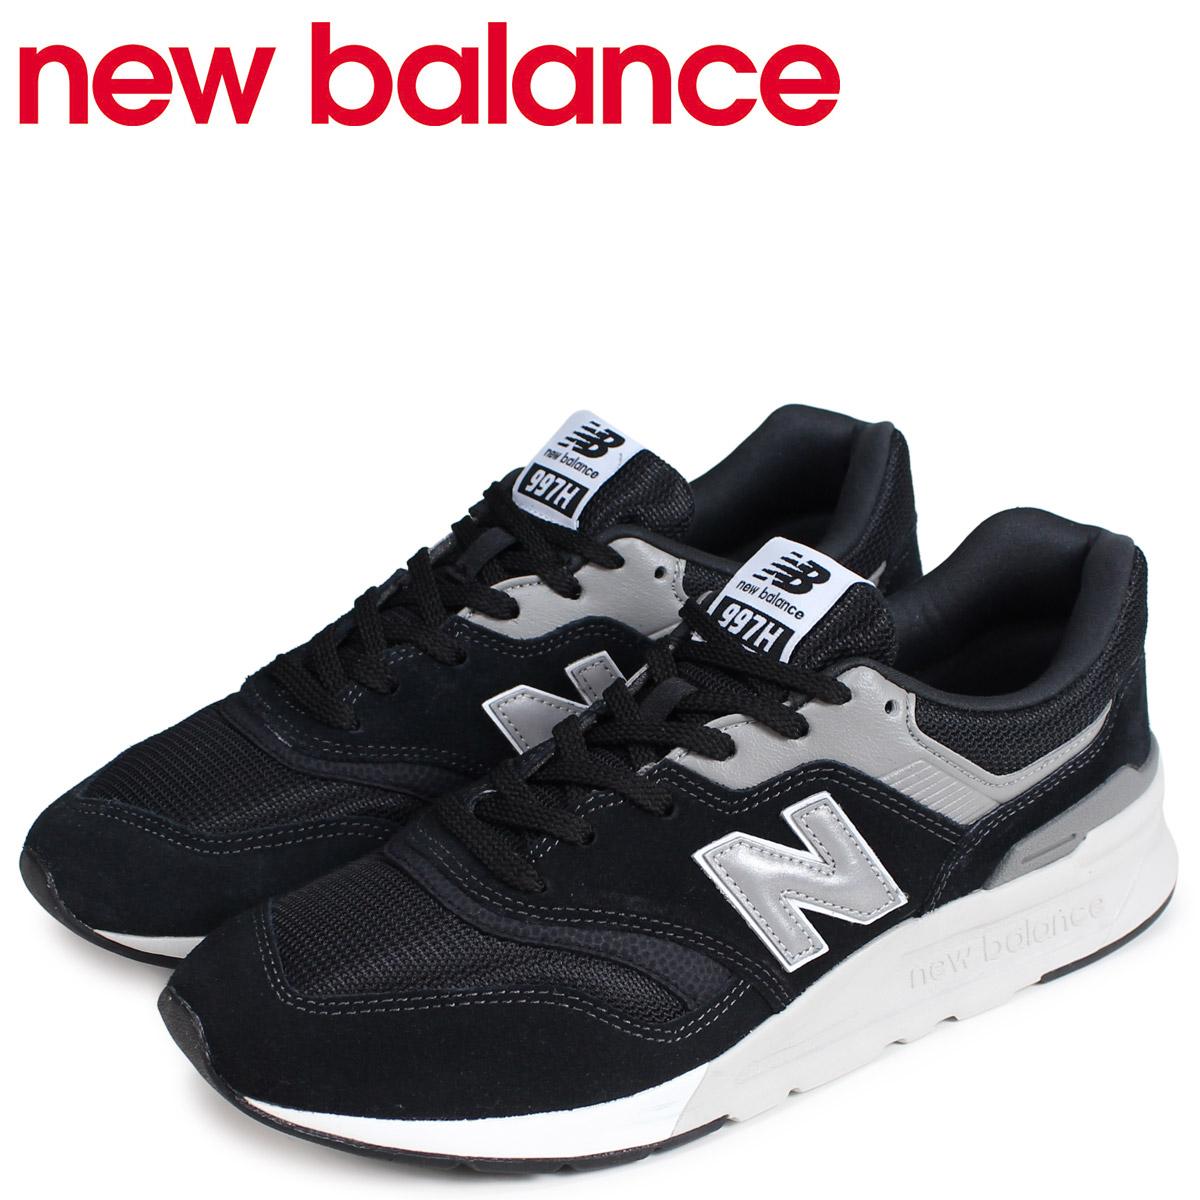 new balance 997 cm997hcc